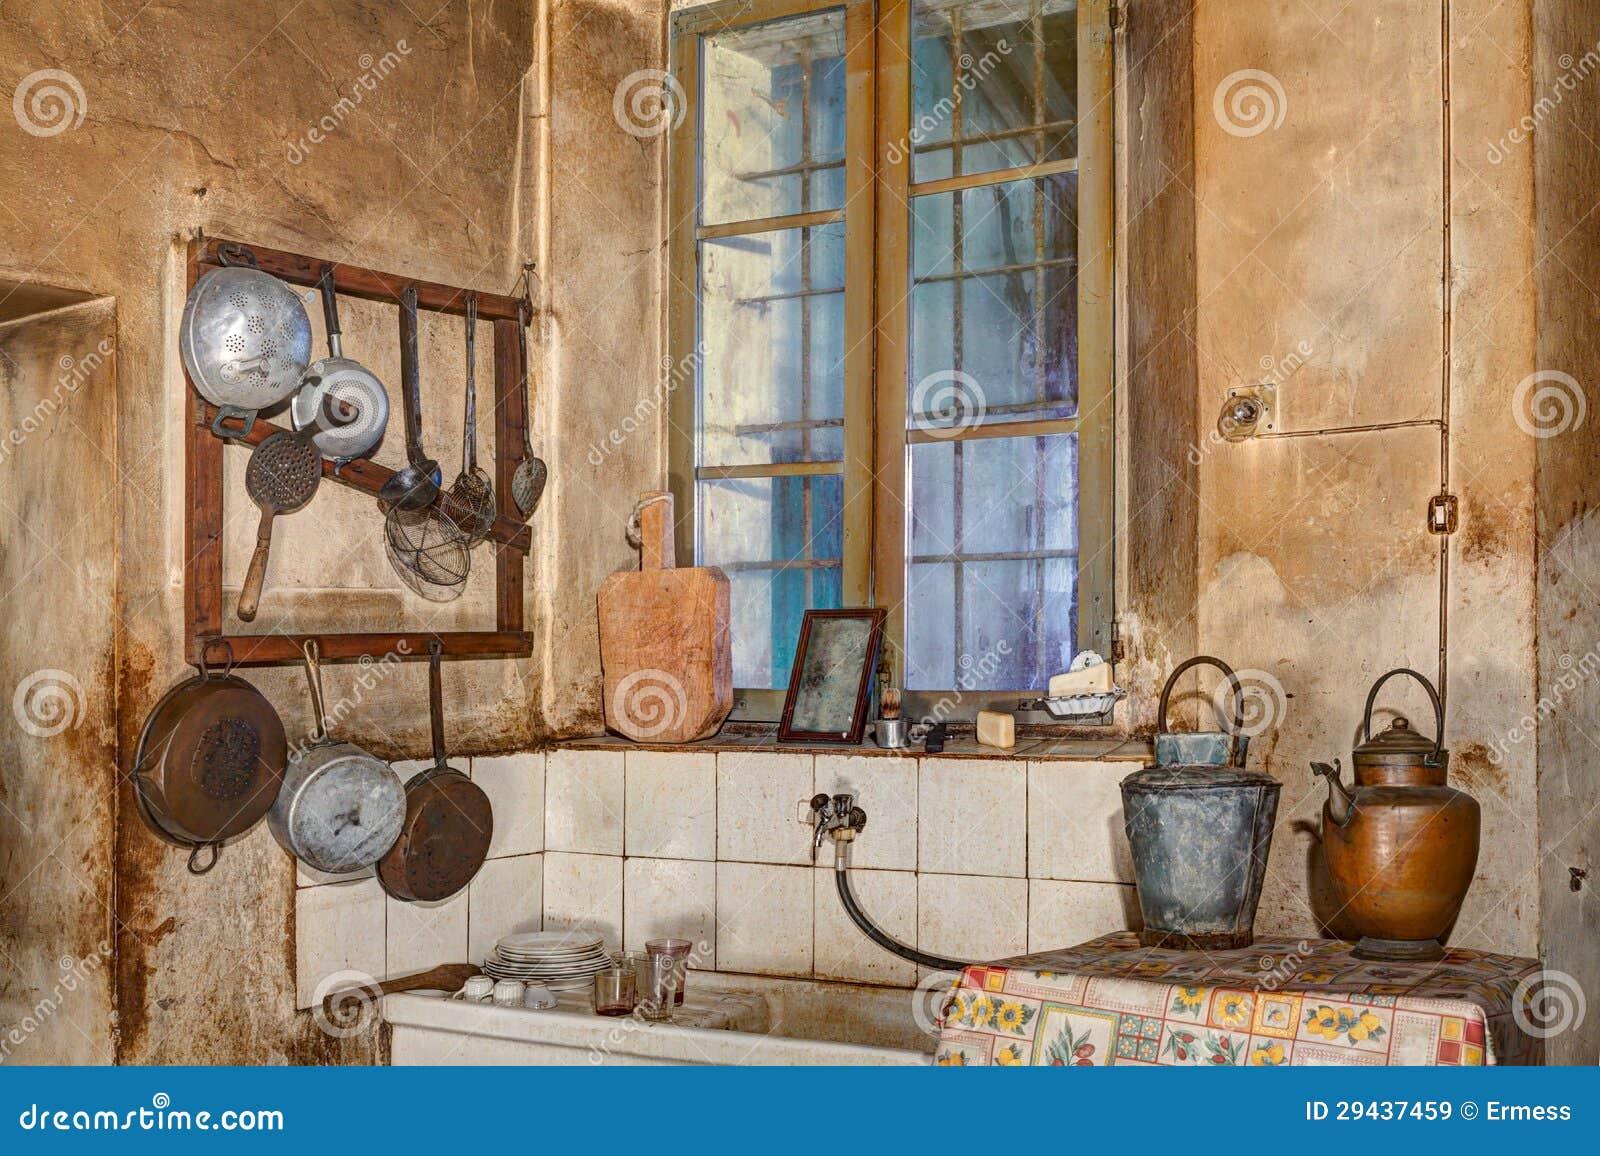 ≥ oude keuken keuken complete keukens marktplaats